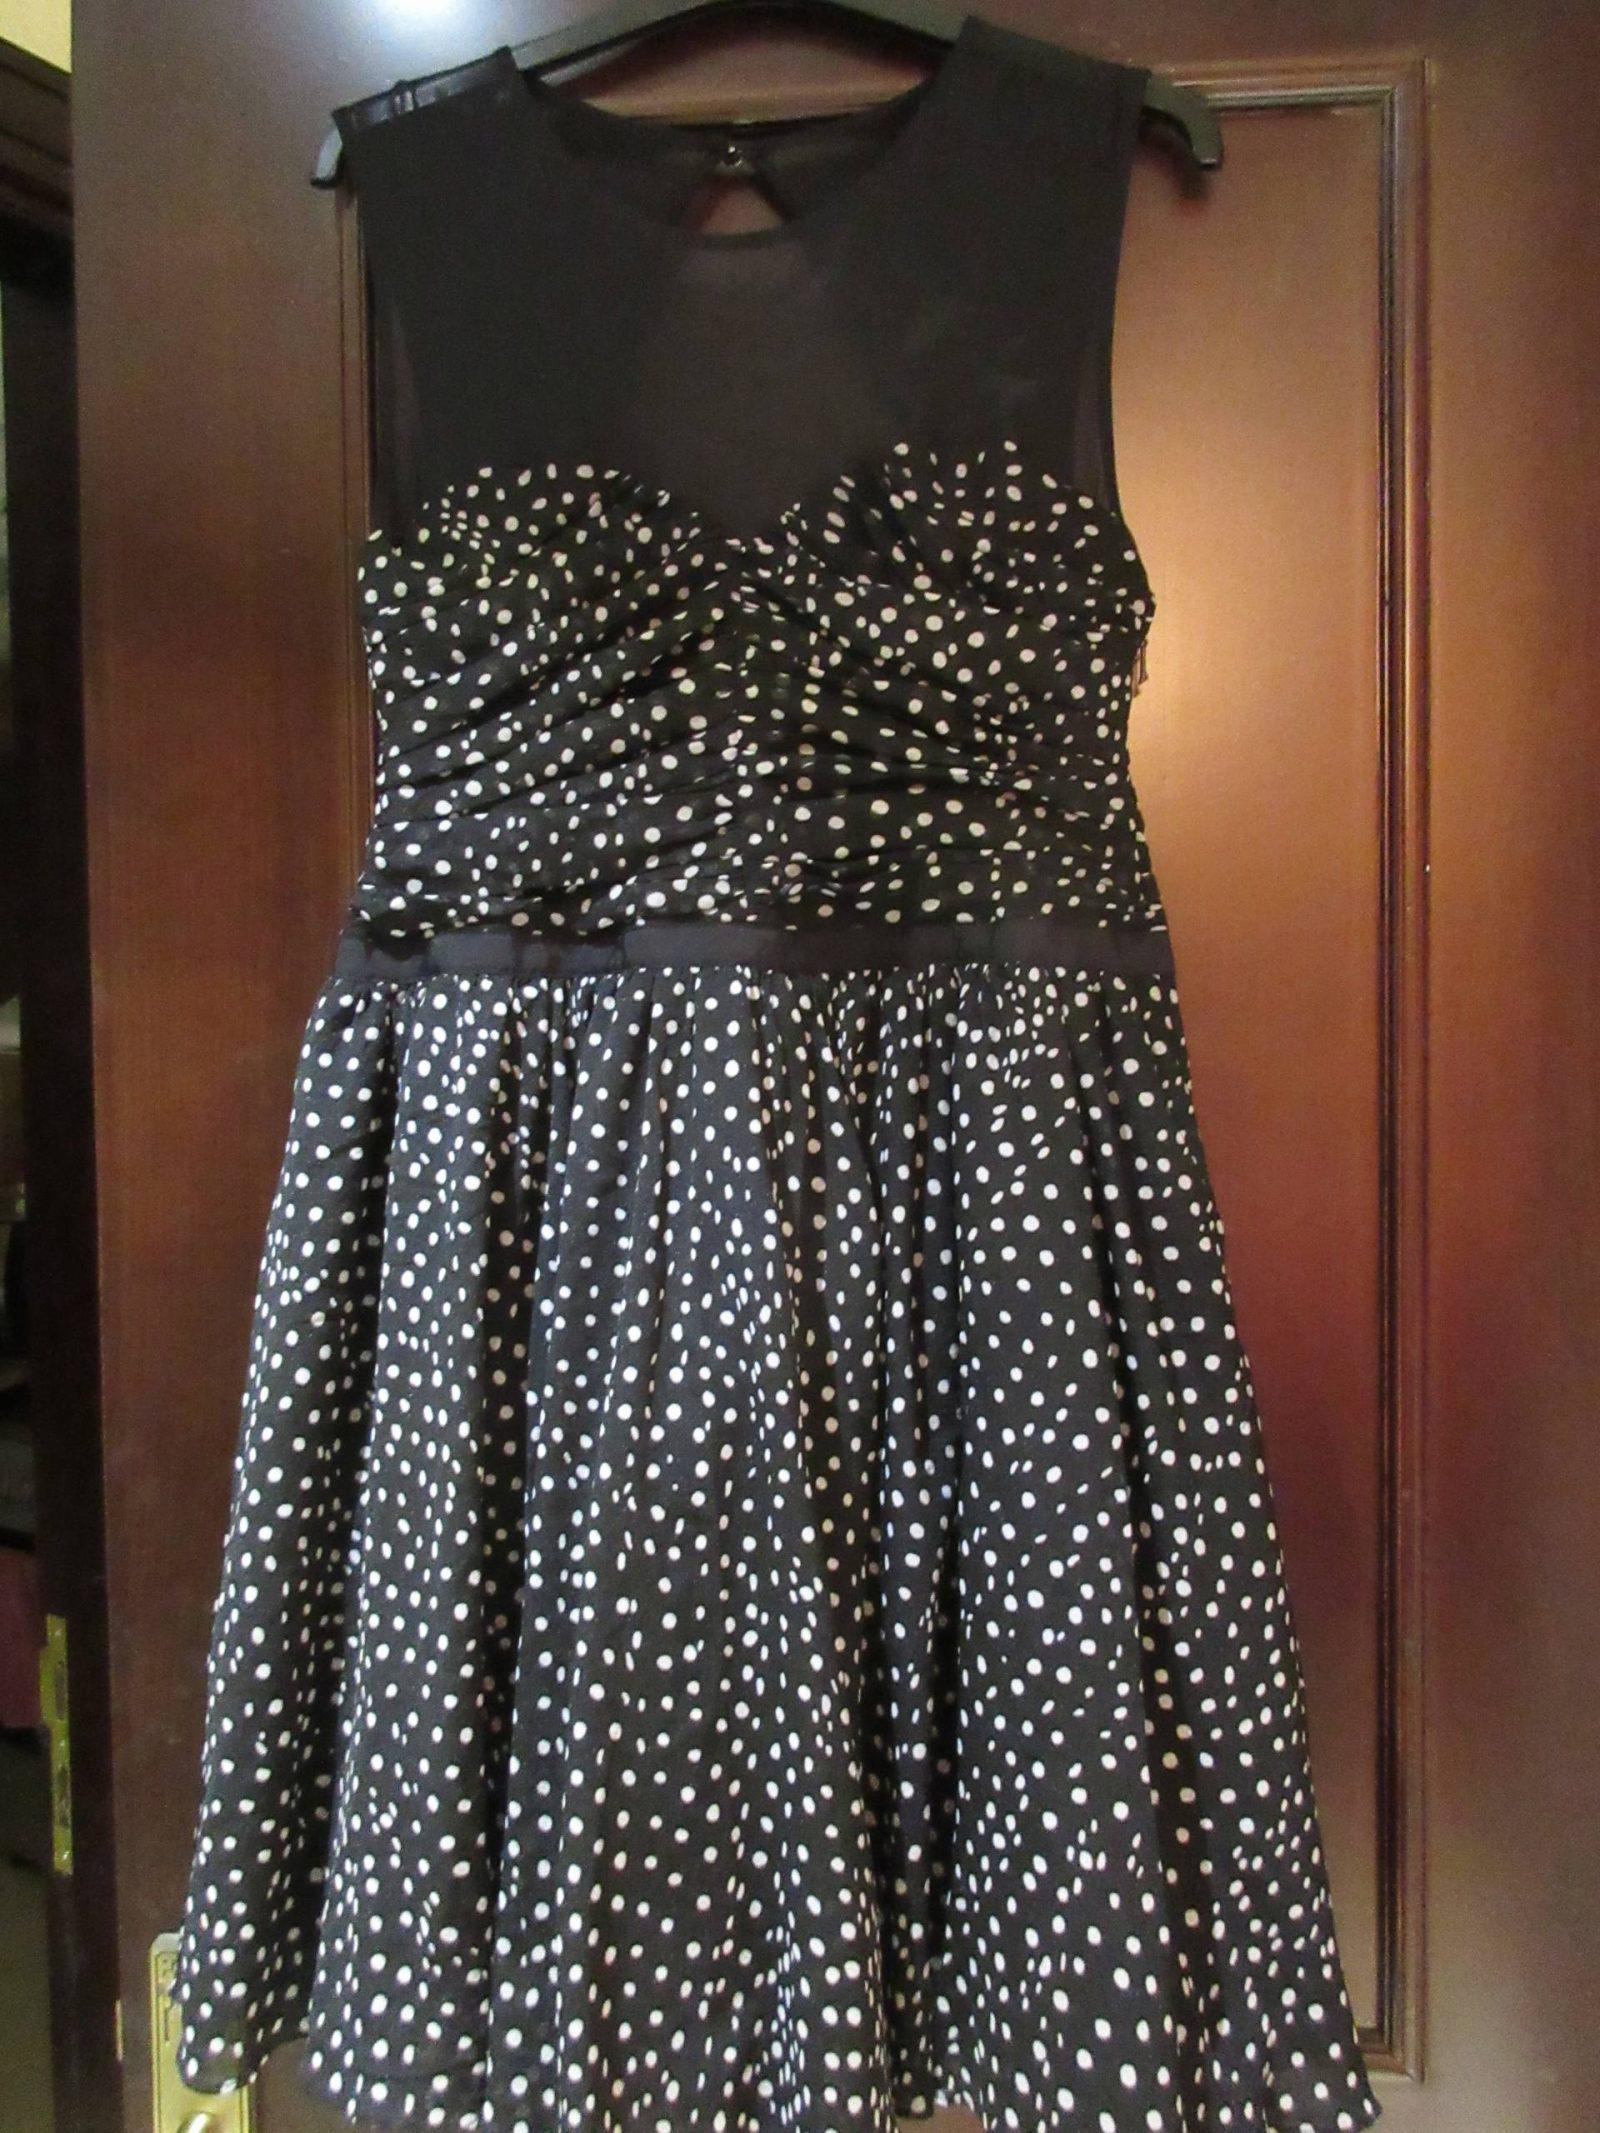 Dubai Malls - Guess dress